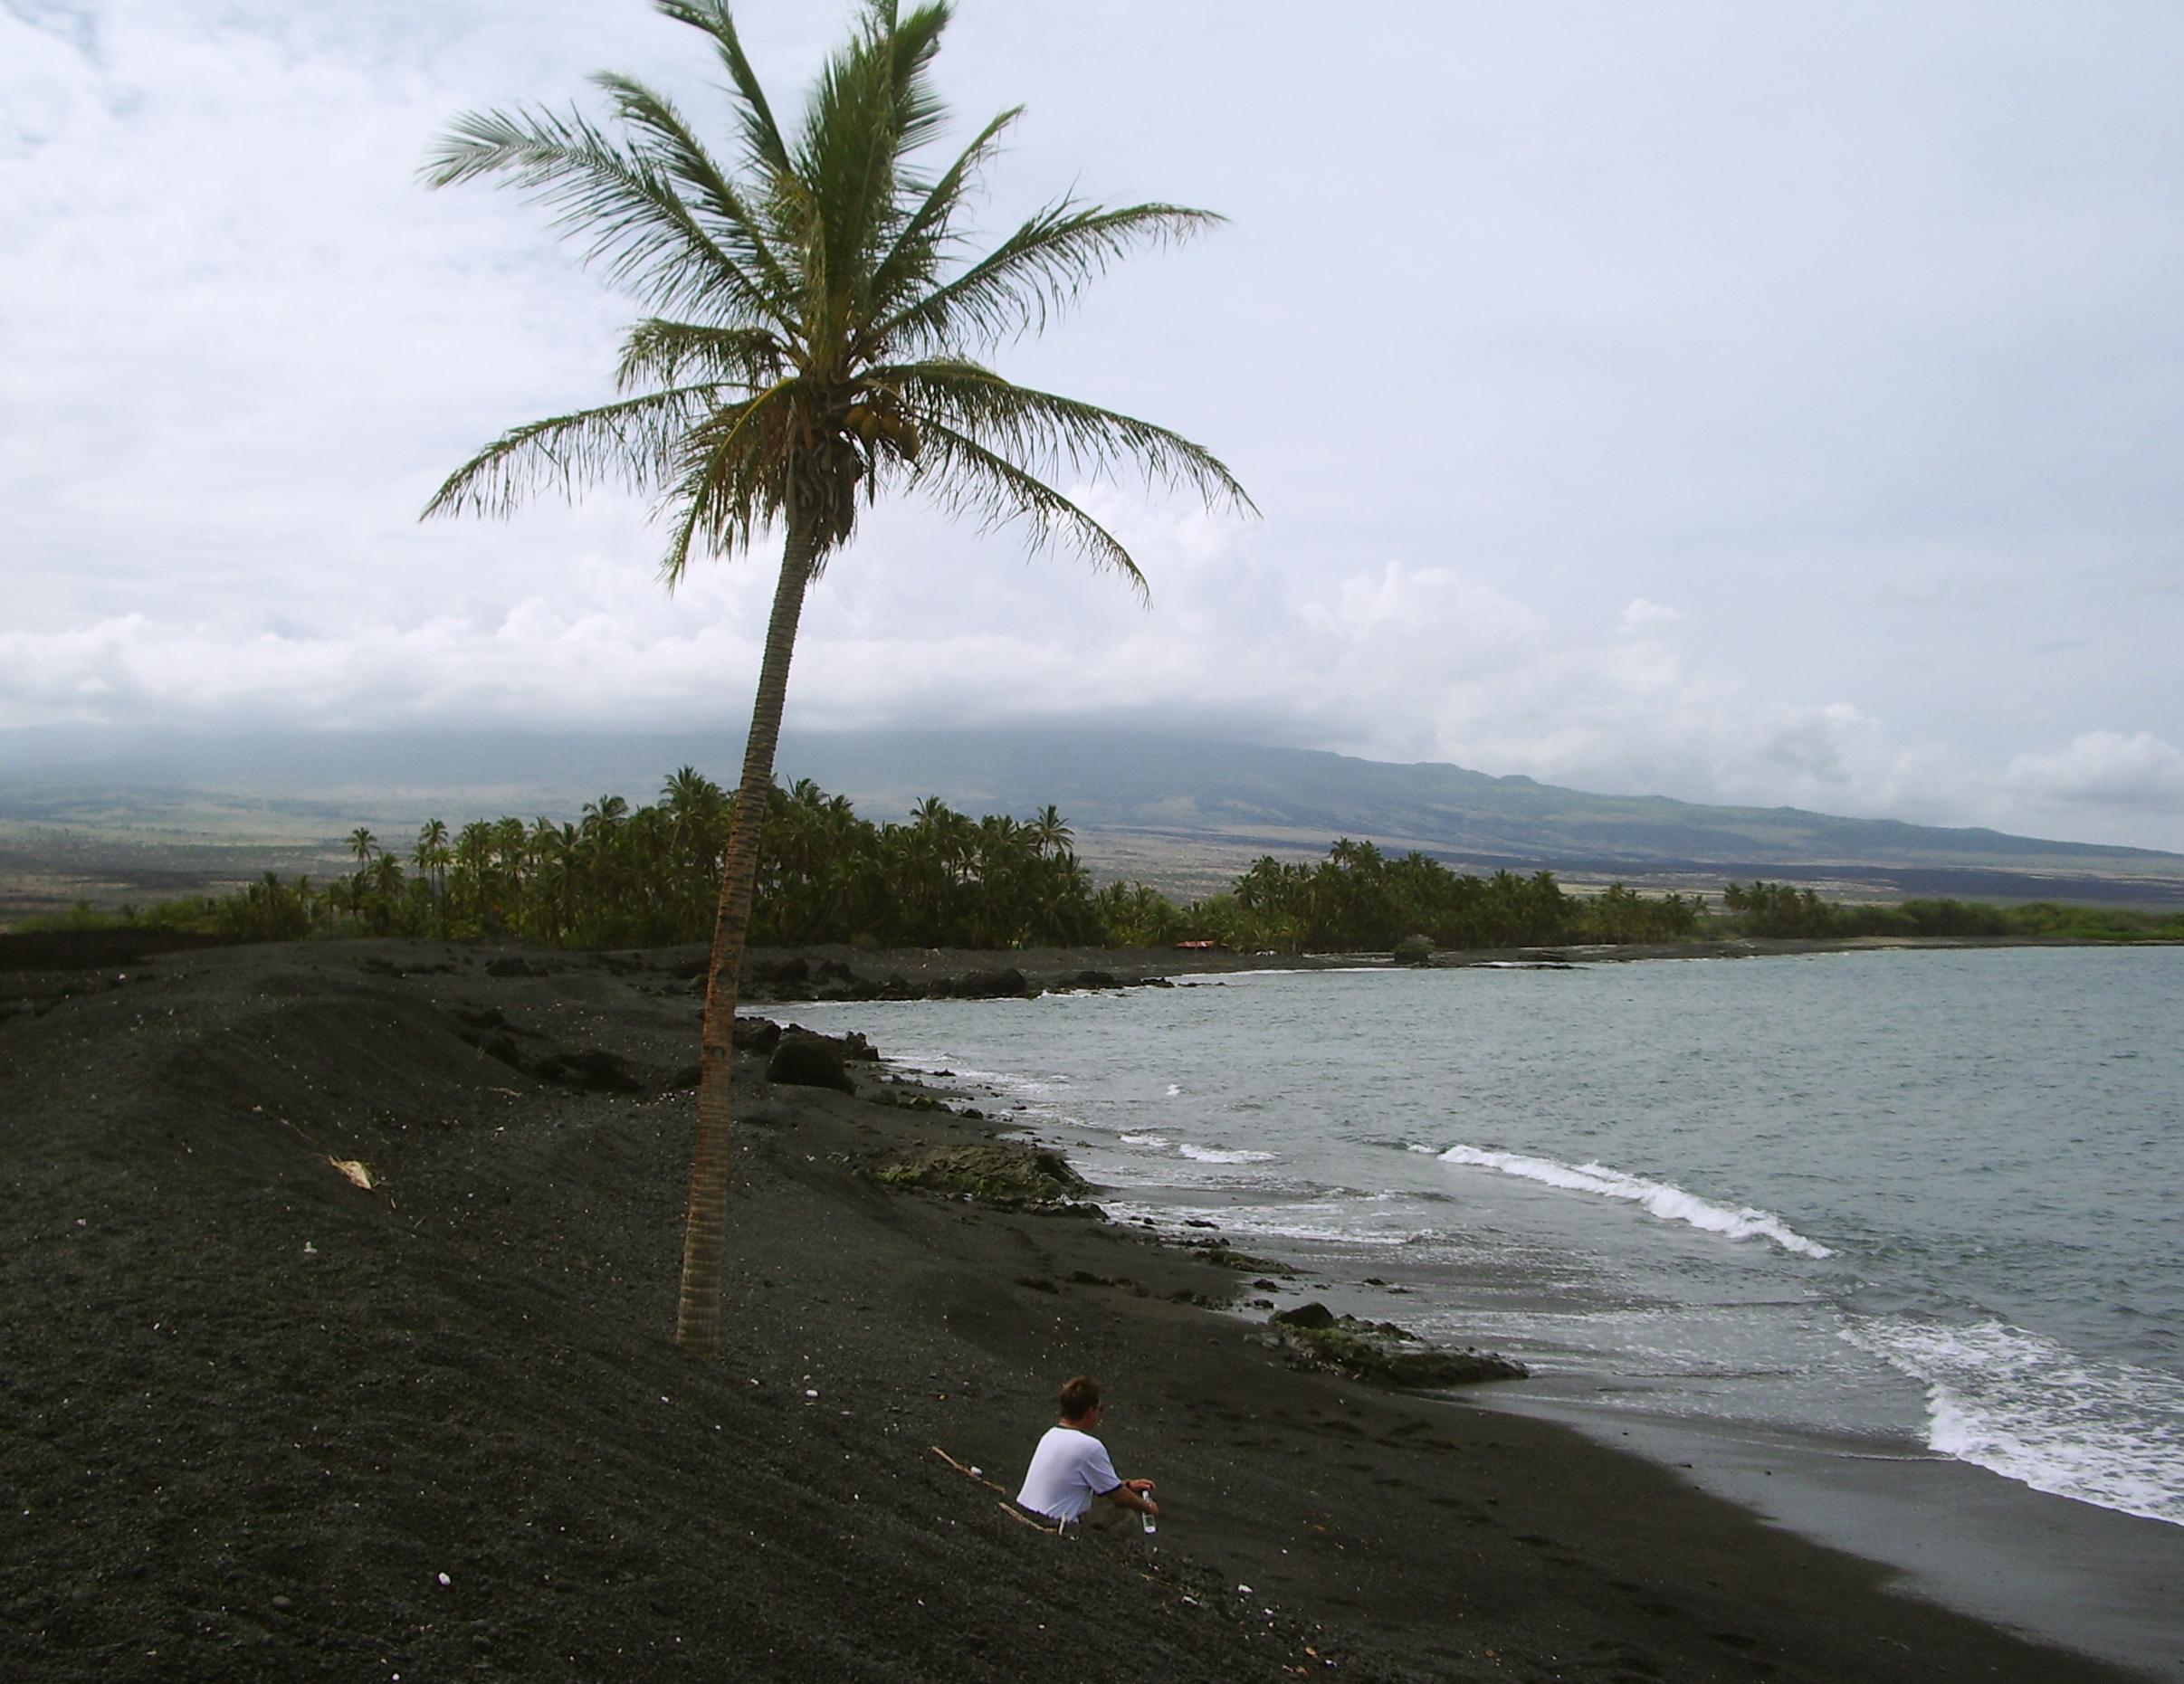 Hidden Secrets Of Hawaii The Golden Ponds Ke Awa Iki Bart Hunt And Curious Lone Palm Tree A Keawaiki Beach Hualalai Volcano In Background